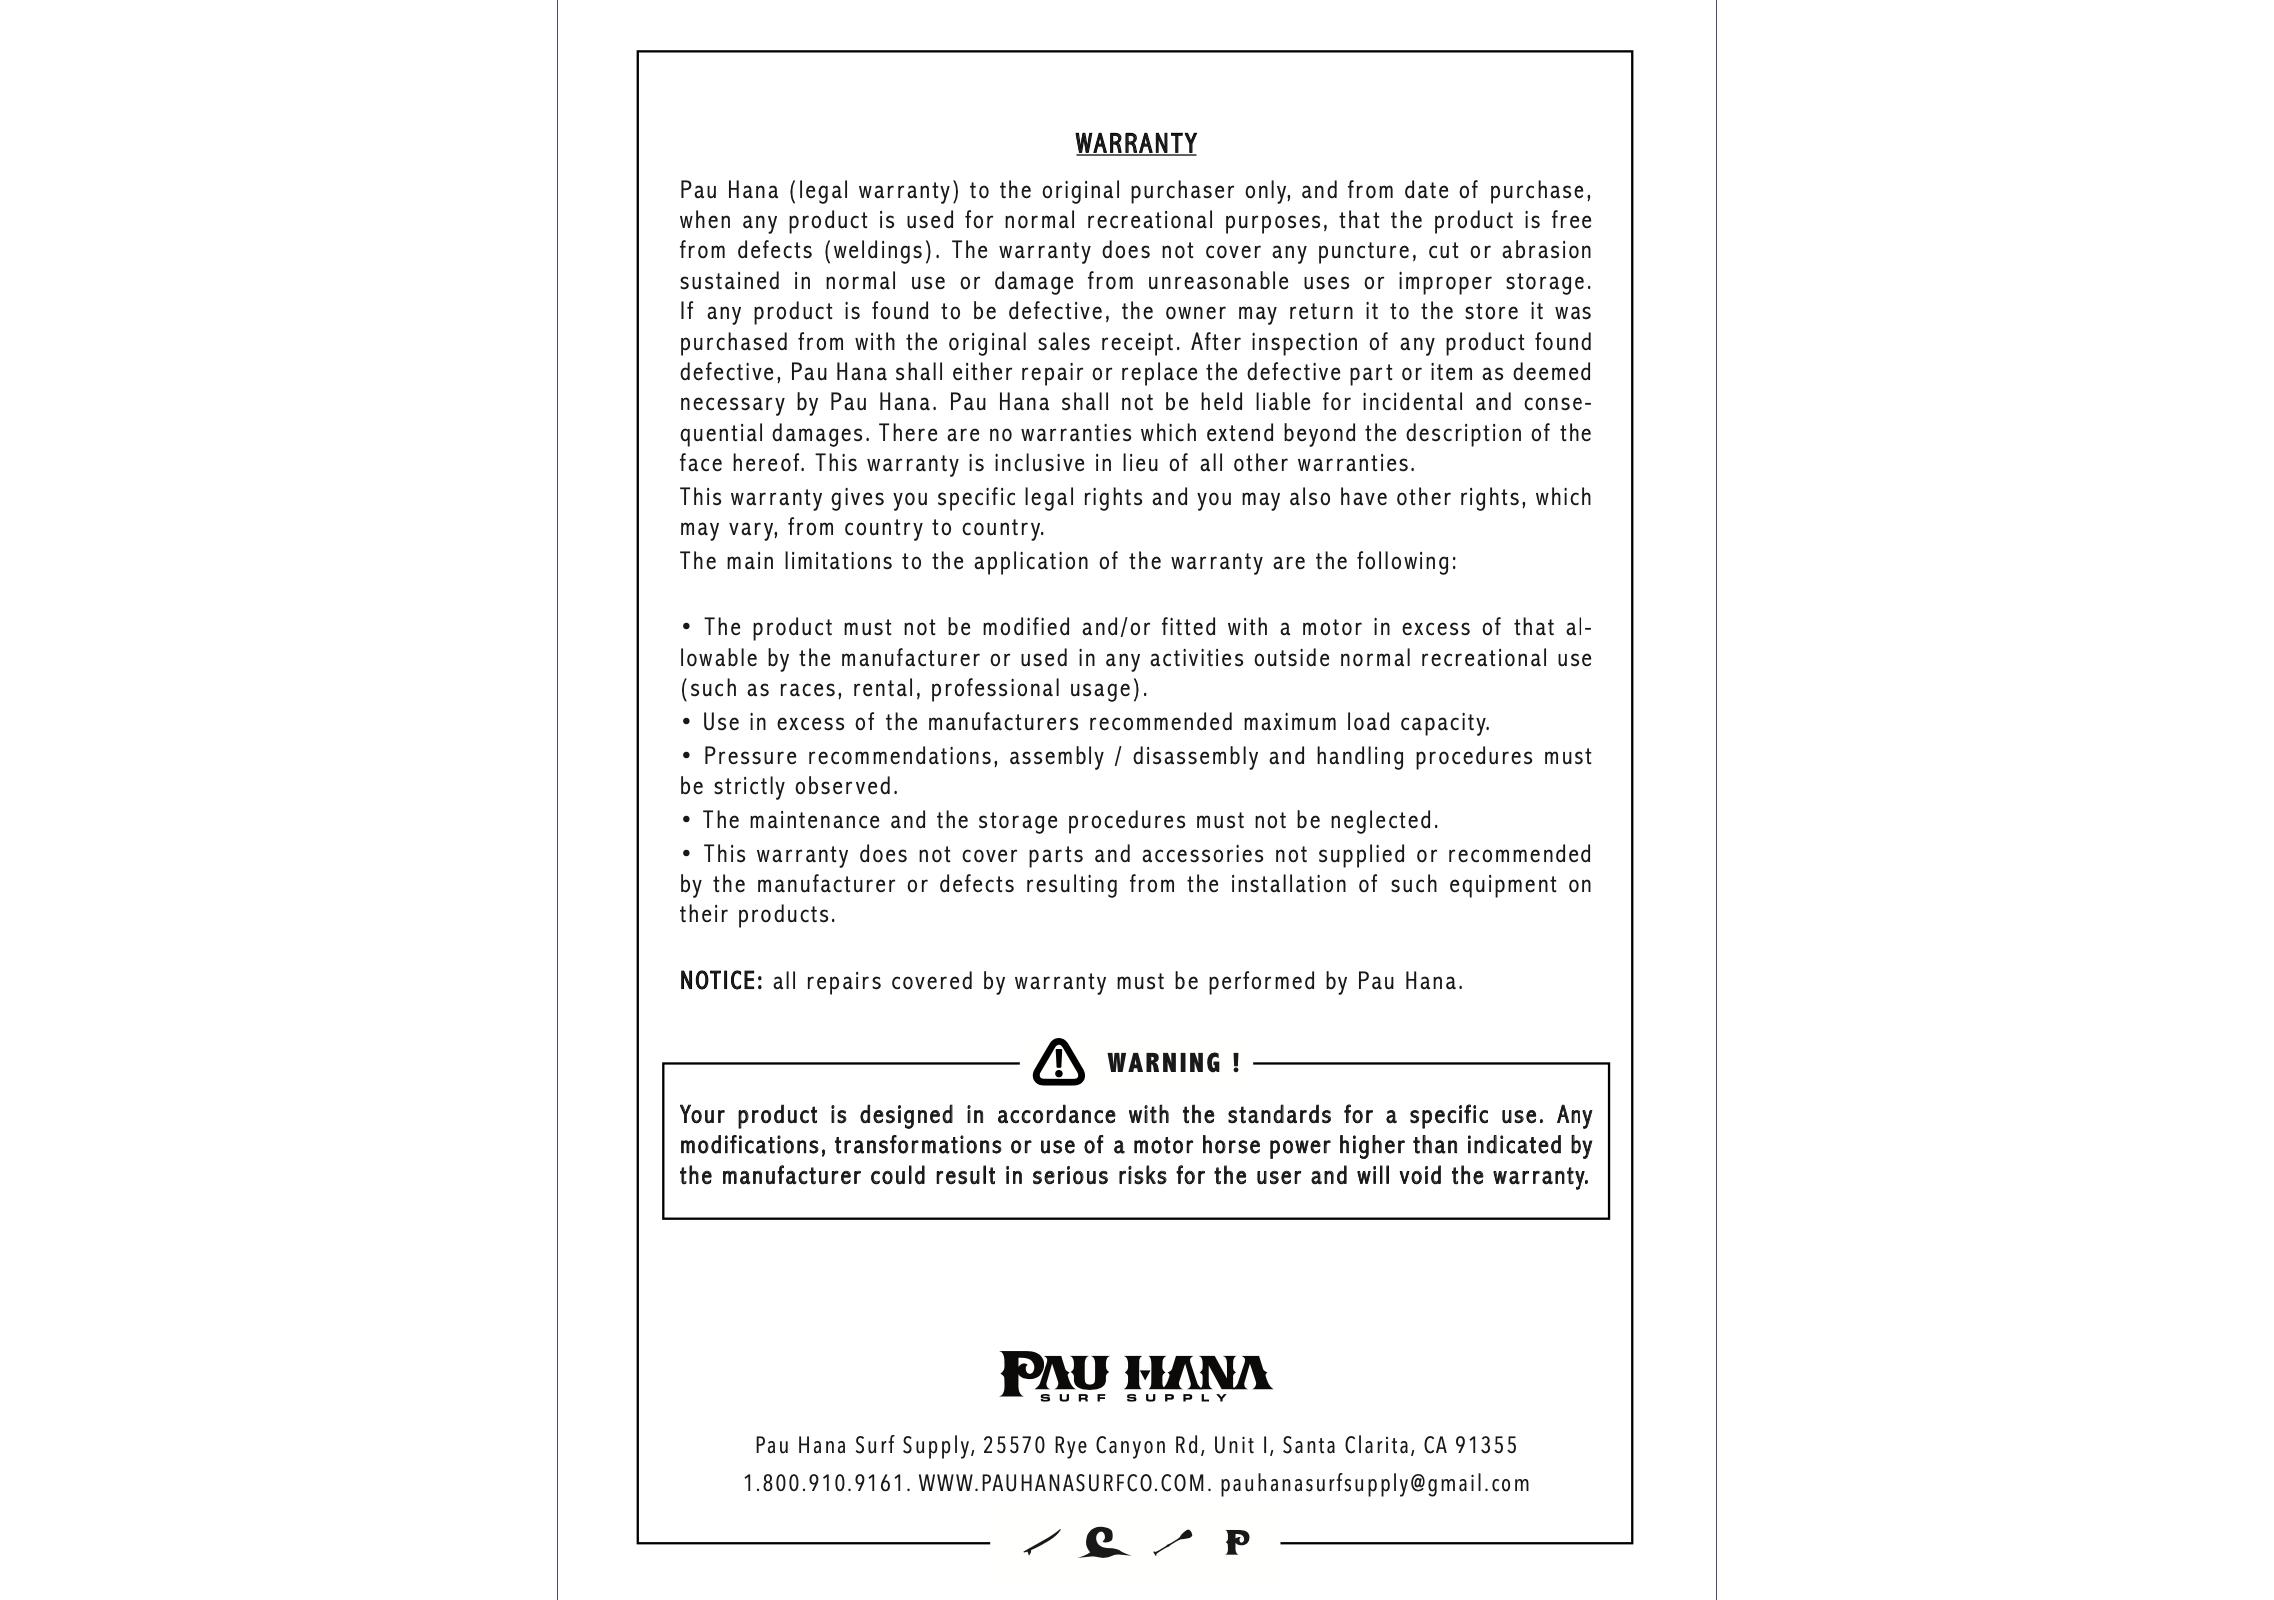 pau hana inflatable stand up paddle board user manual page 8